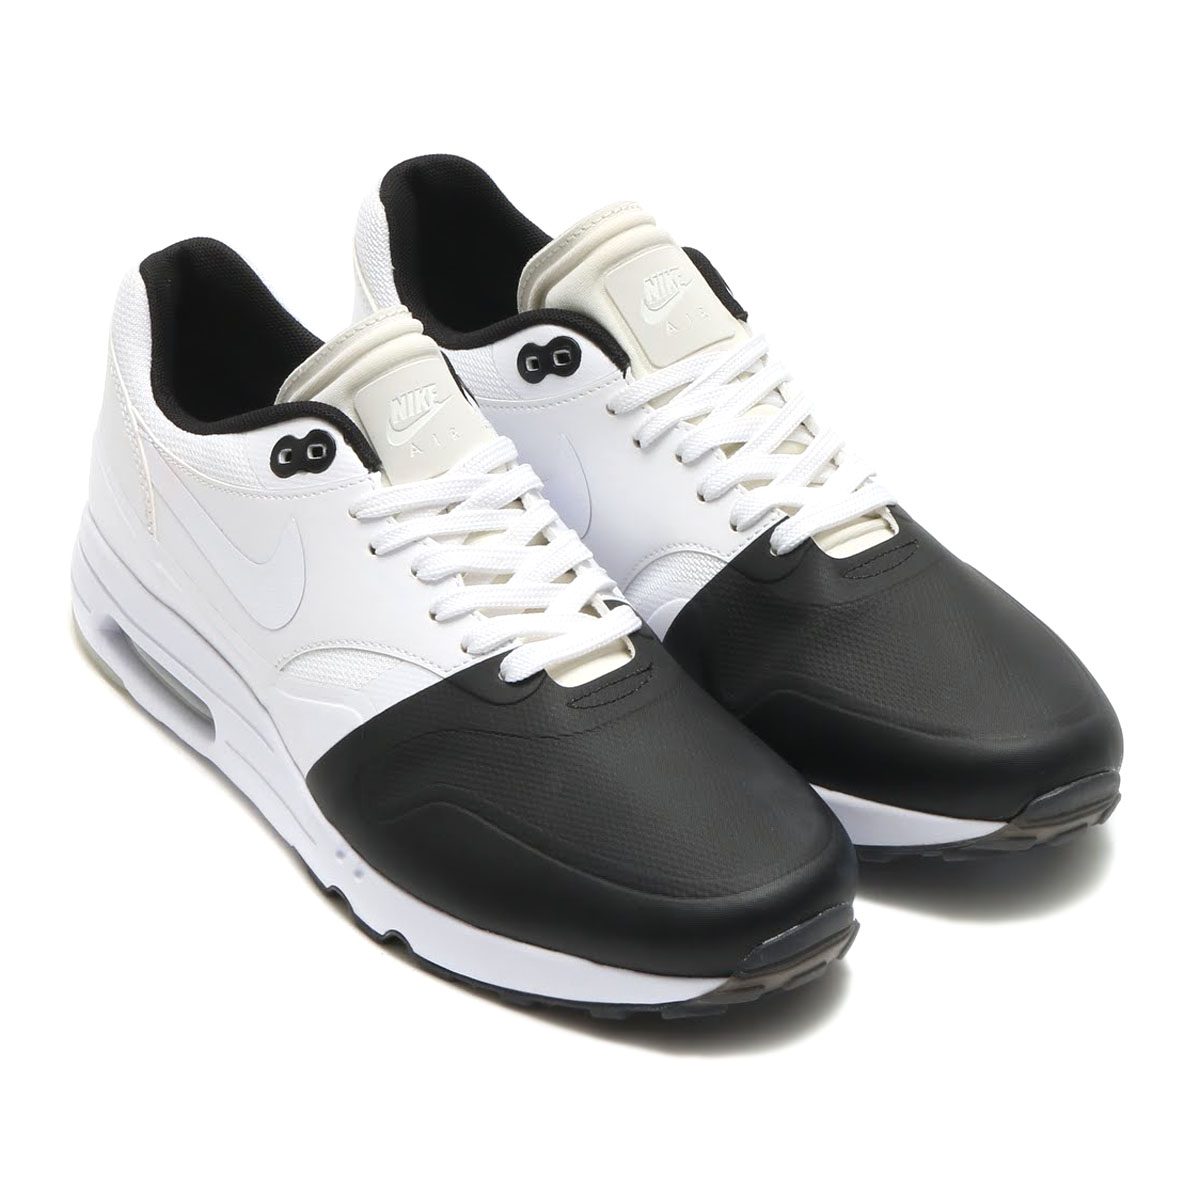 Nike Air Max 1 Ultra 2 0 SE 875845 001 Black White Black White